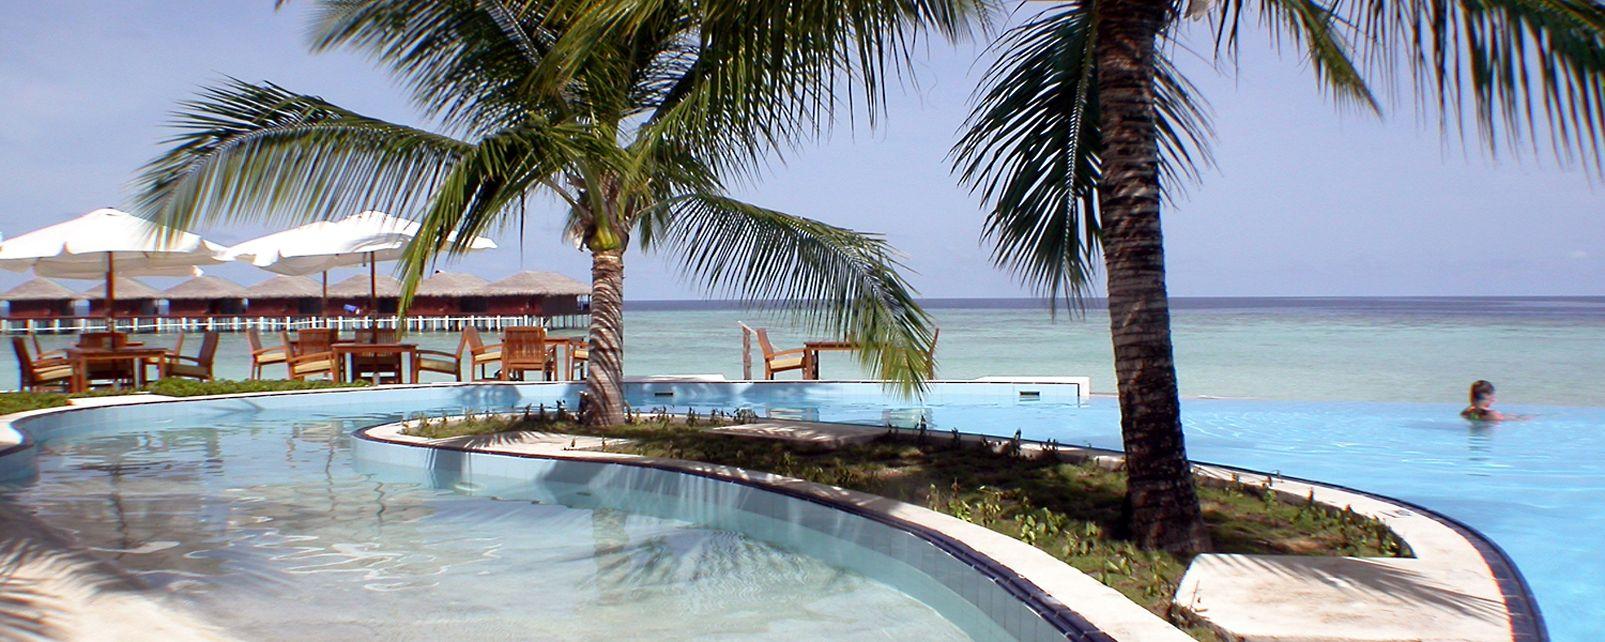 Flug Und Hotel Island